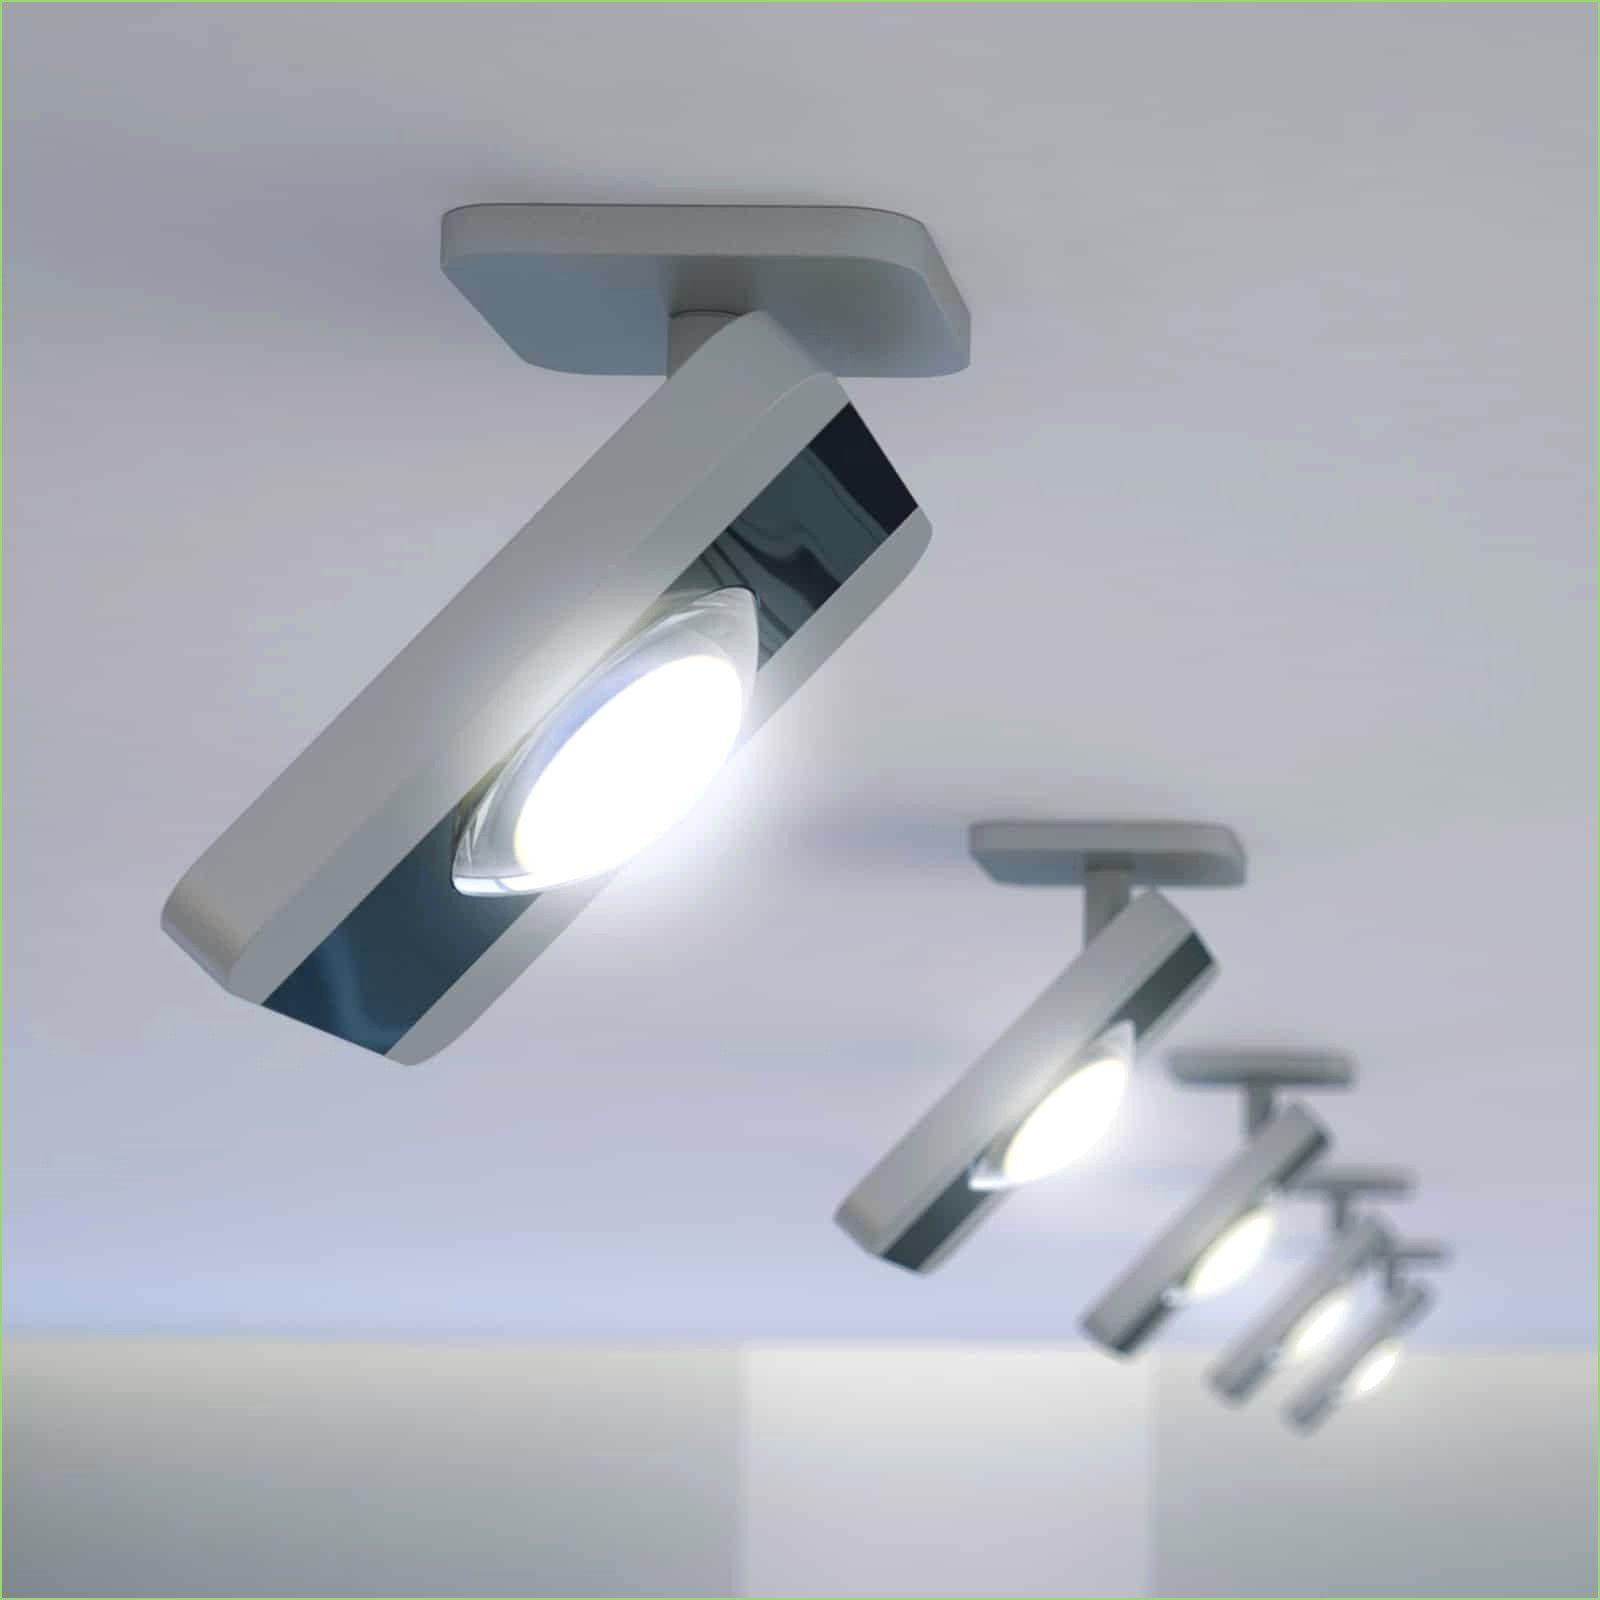 Unique Lampe Salle De Bain Castorama Track Lighting Ceiling Lights Lamp